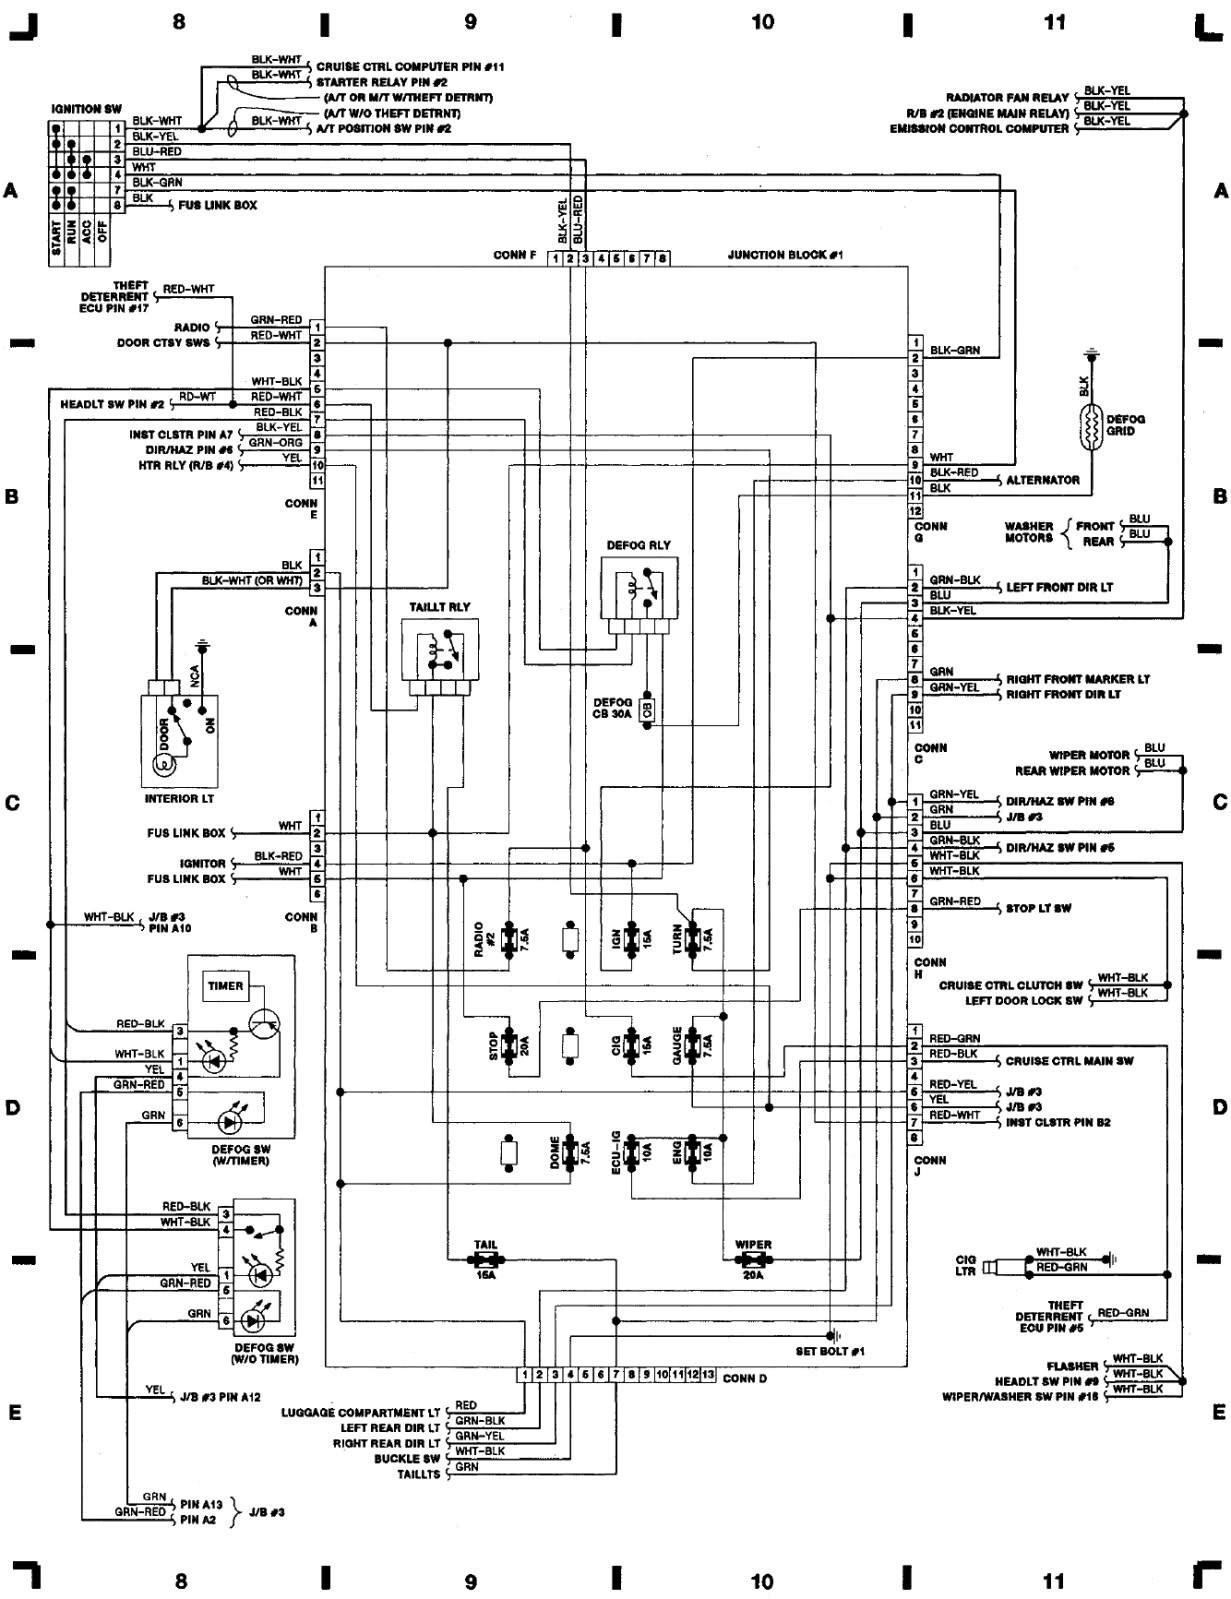 Cw 82 Corolla Wiring Diagram Free Download Wiring